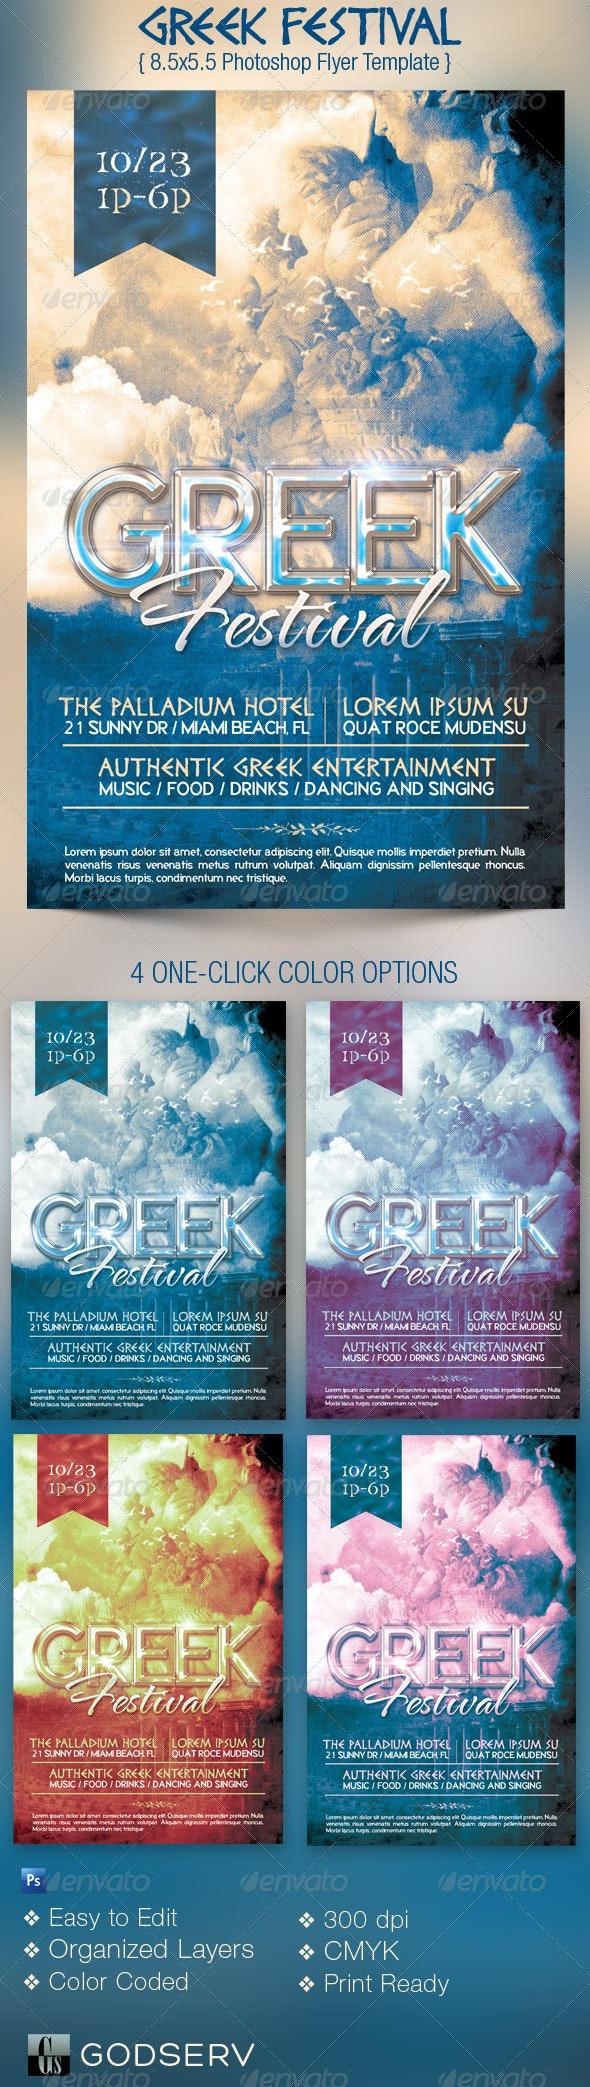 Greek Festival Flyer Template - Events Flyers